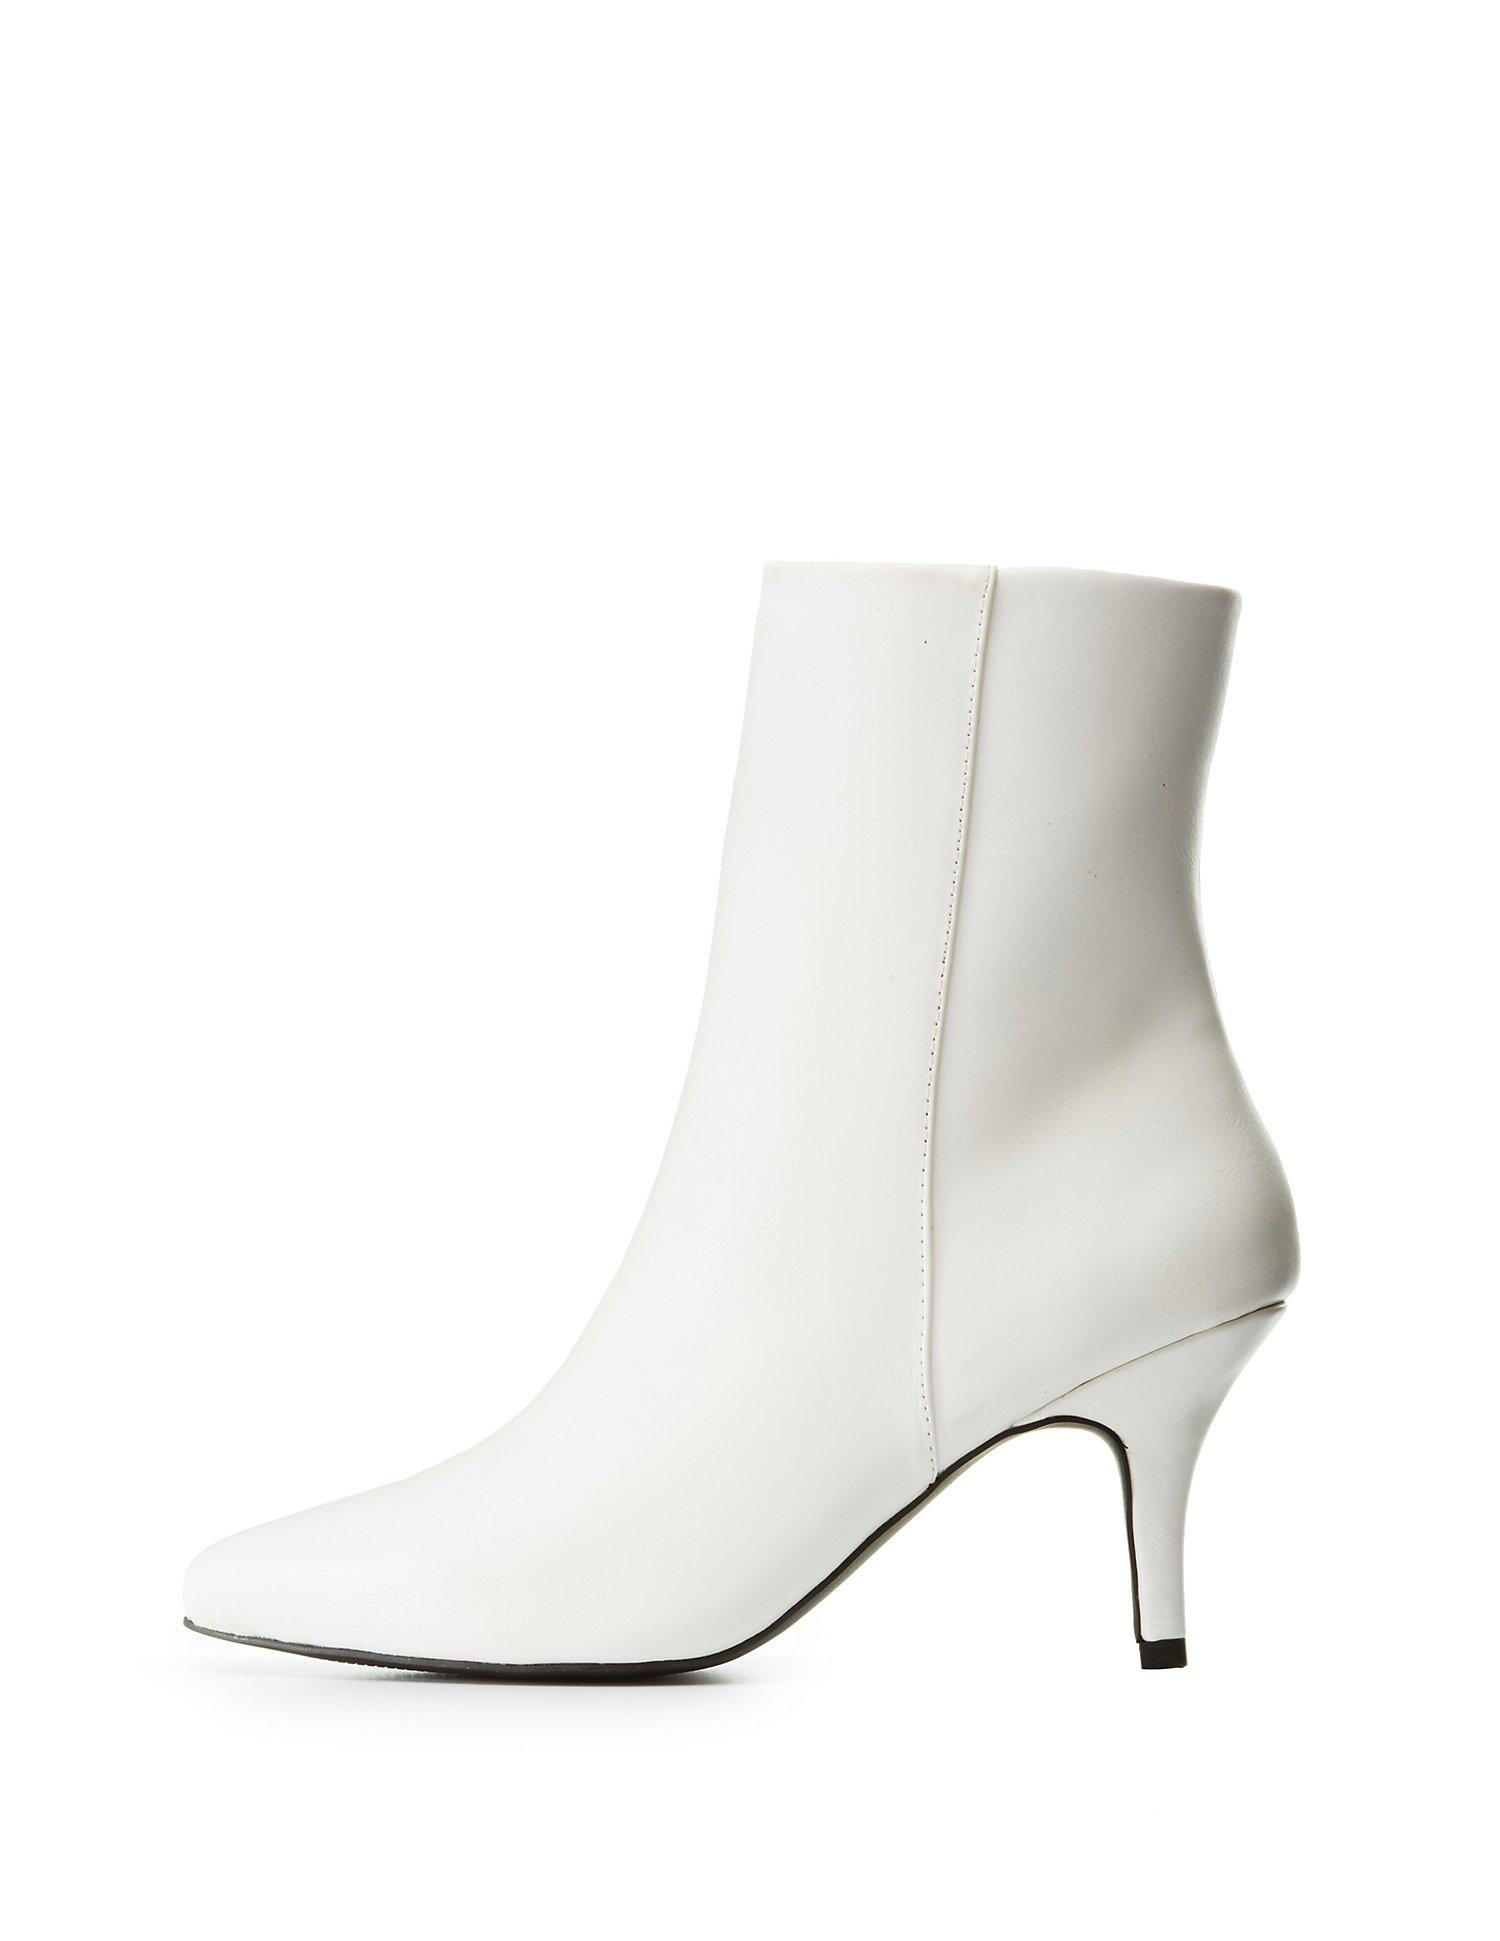 ec6b22d0ac67 Lyst - Charlotte Russe Qupid Pointed Toe Kitten Heel Booties in White